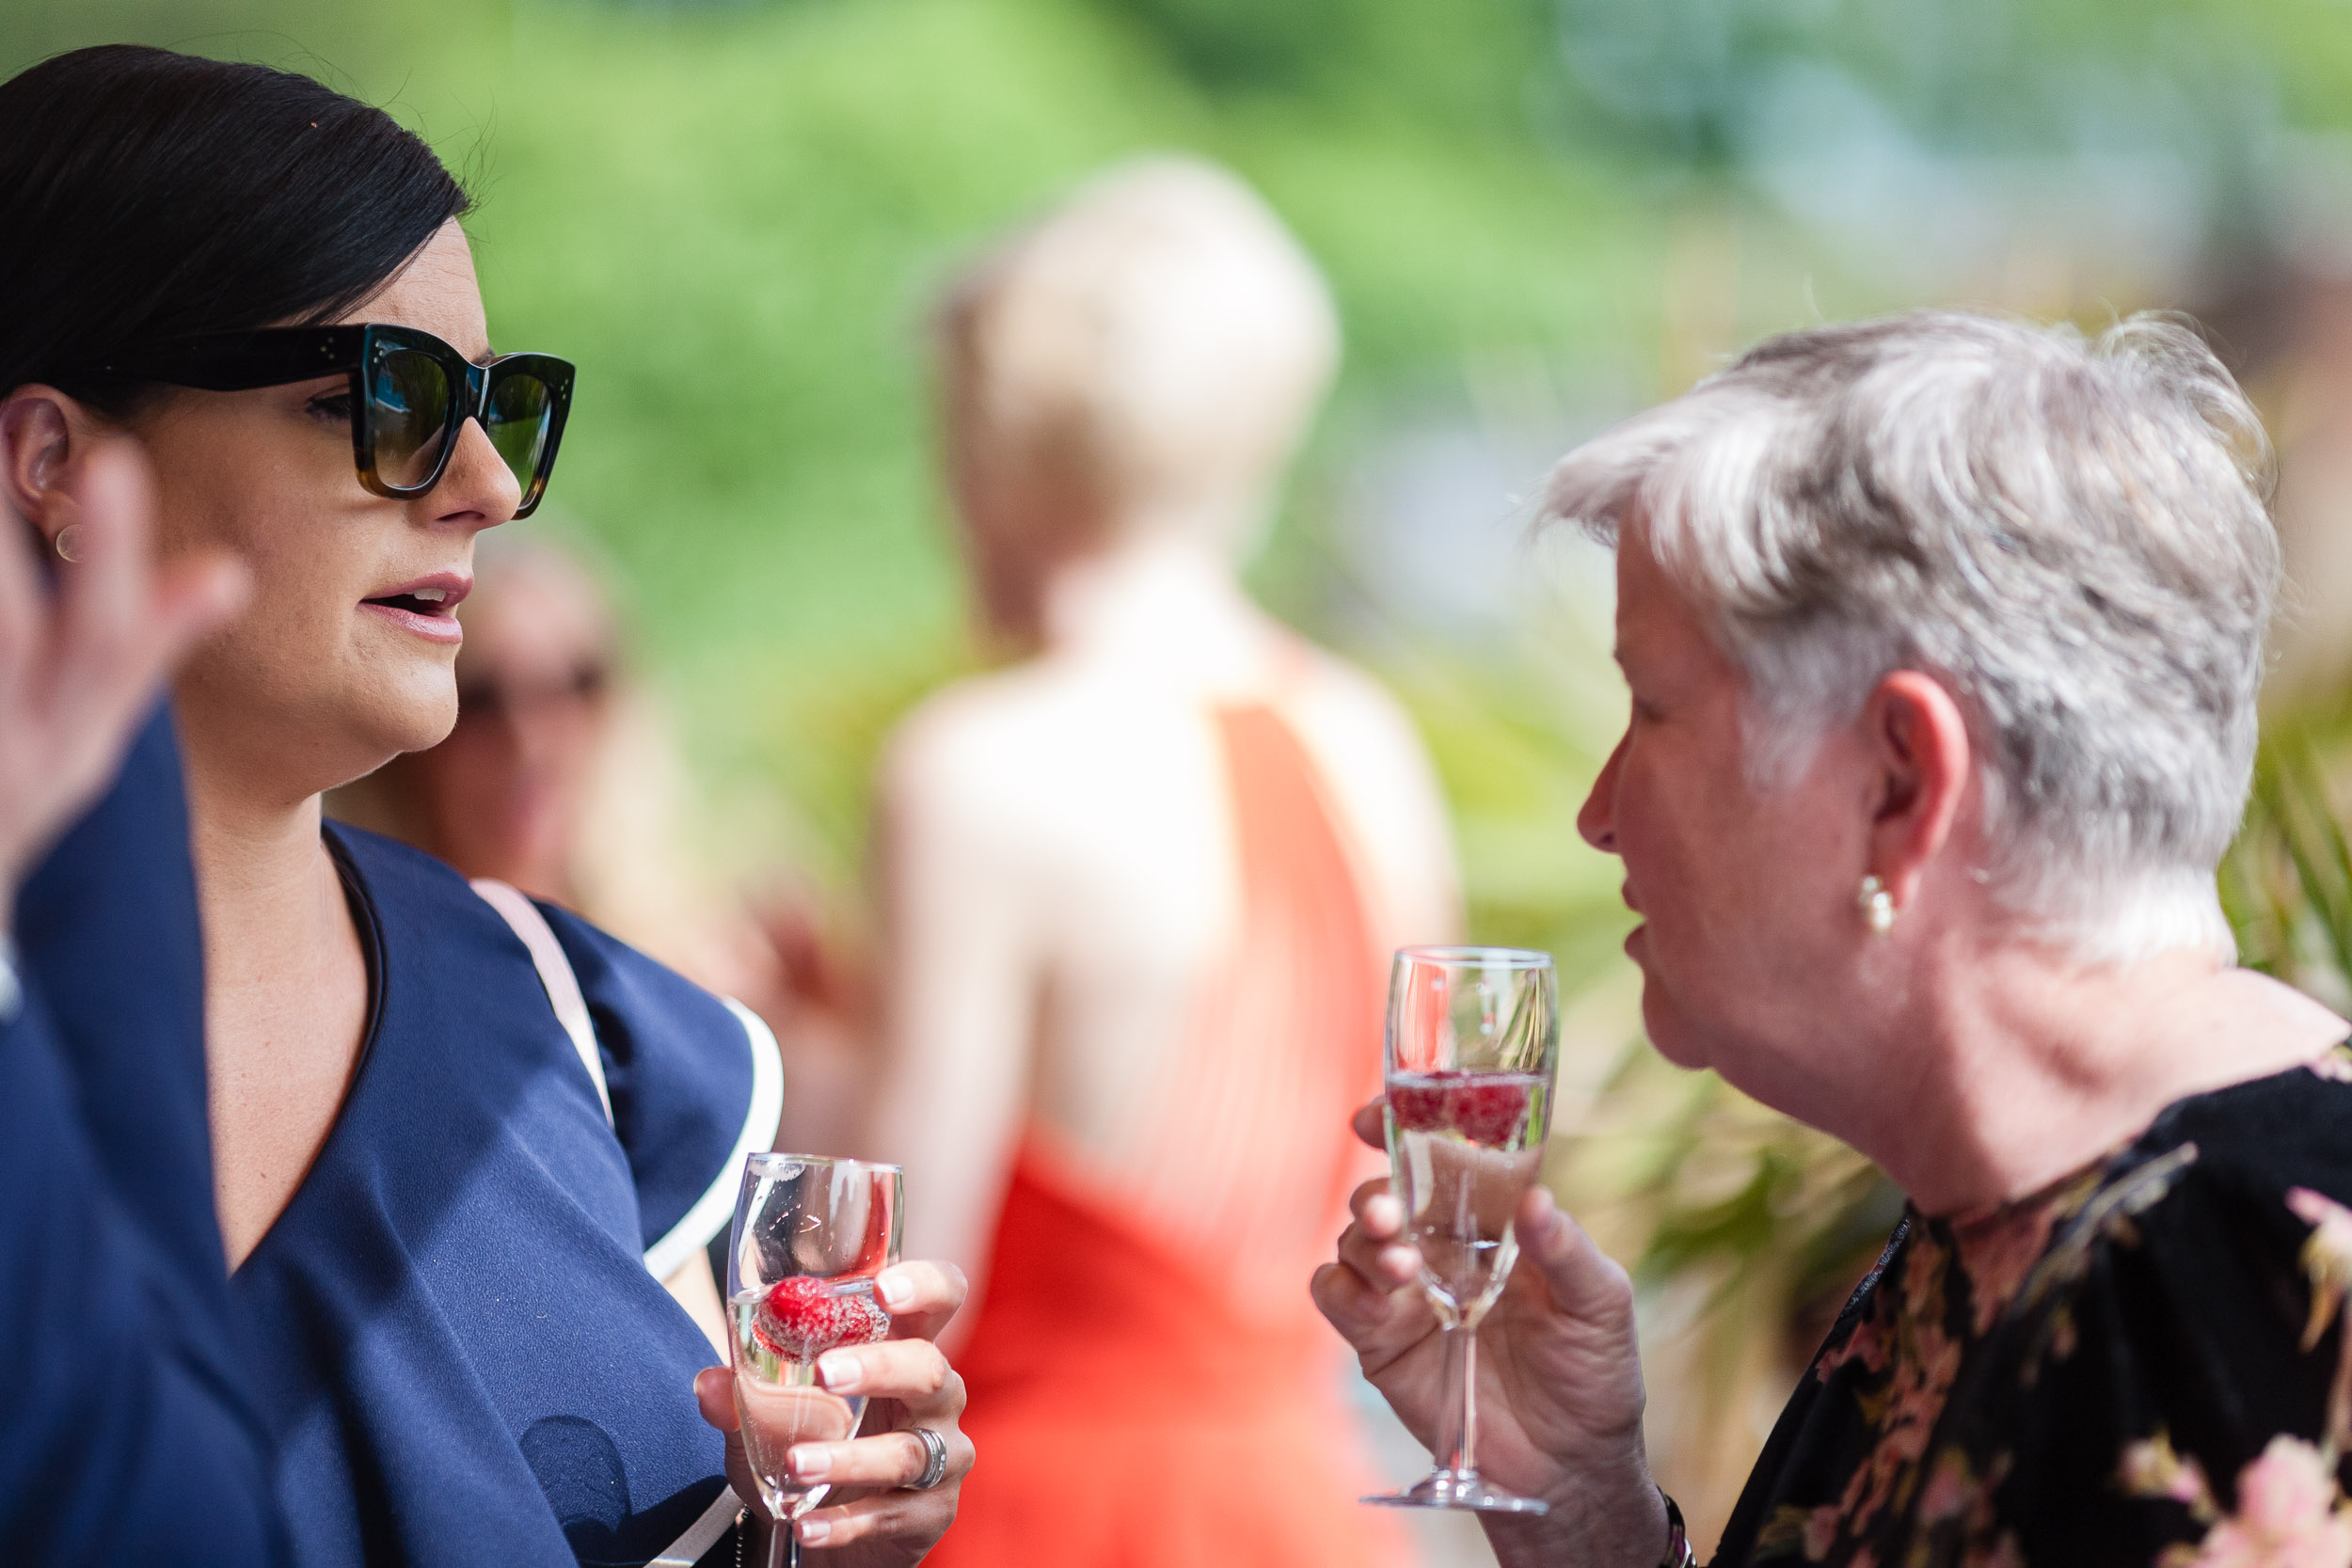 brockwell-lido-brixton-herne-hill-wedding-230.jpg